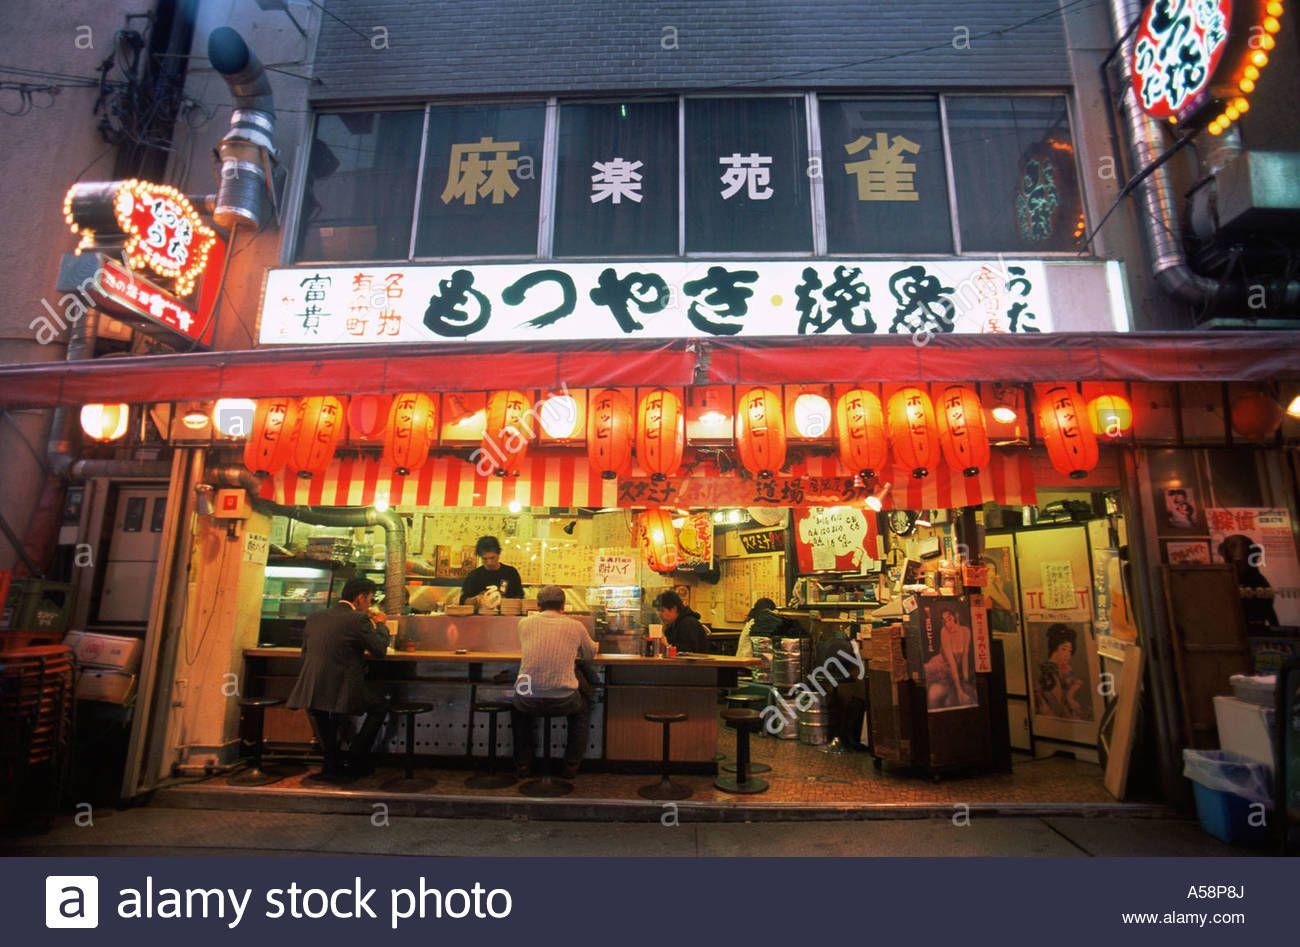 japan-tokyo-ginza-traditional-japanese-restaurant-A58P8J.jpg (1300×947)